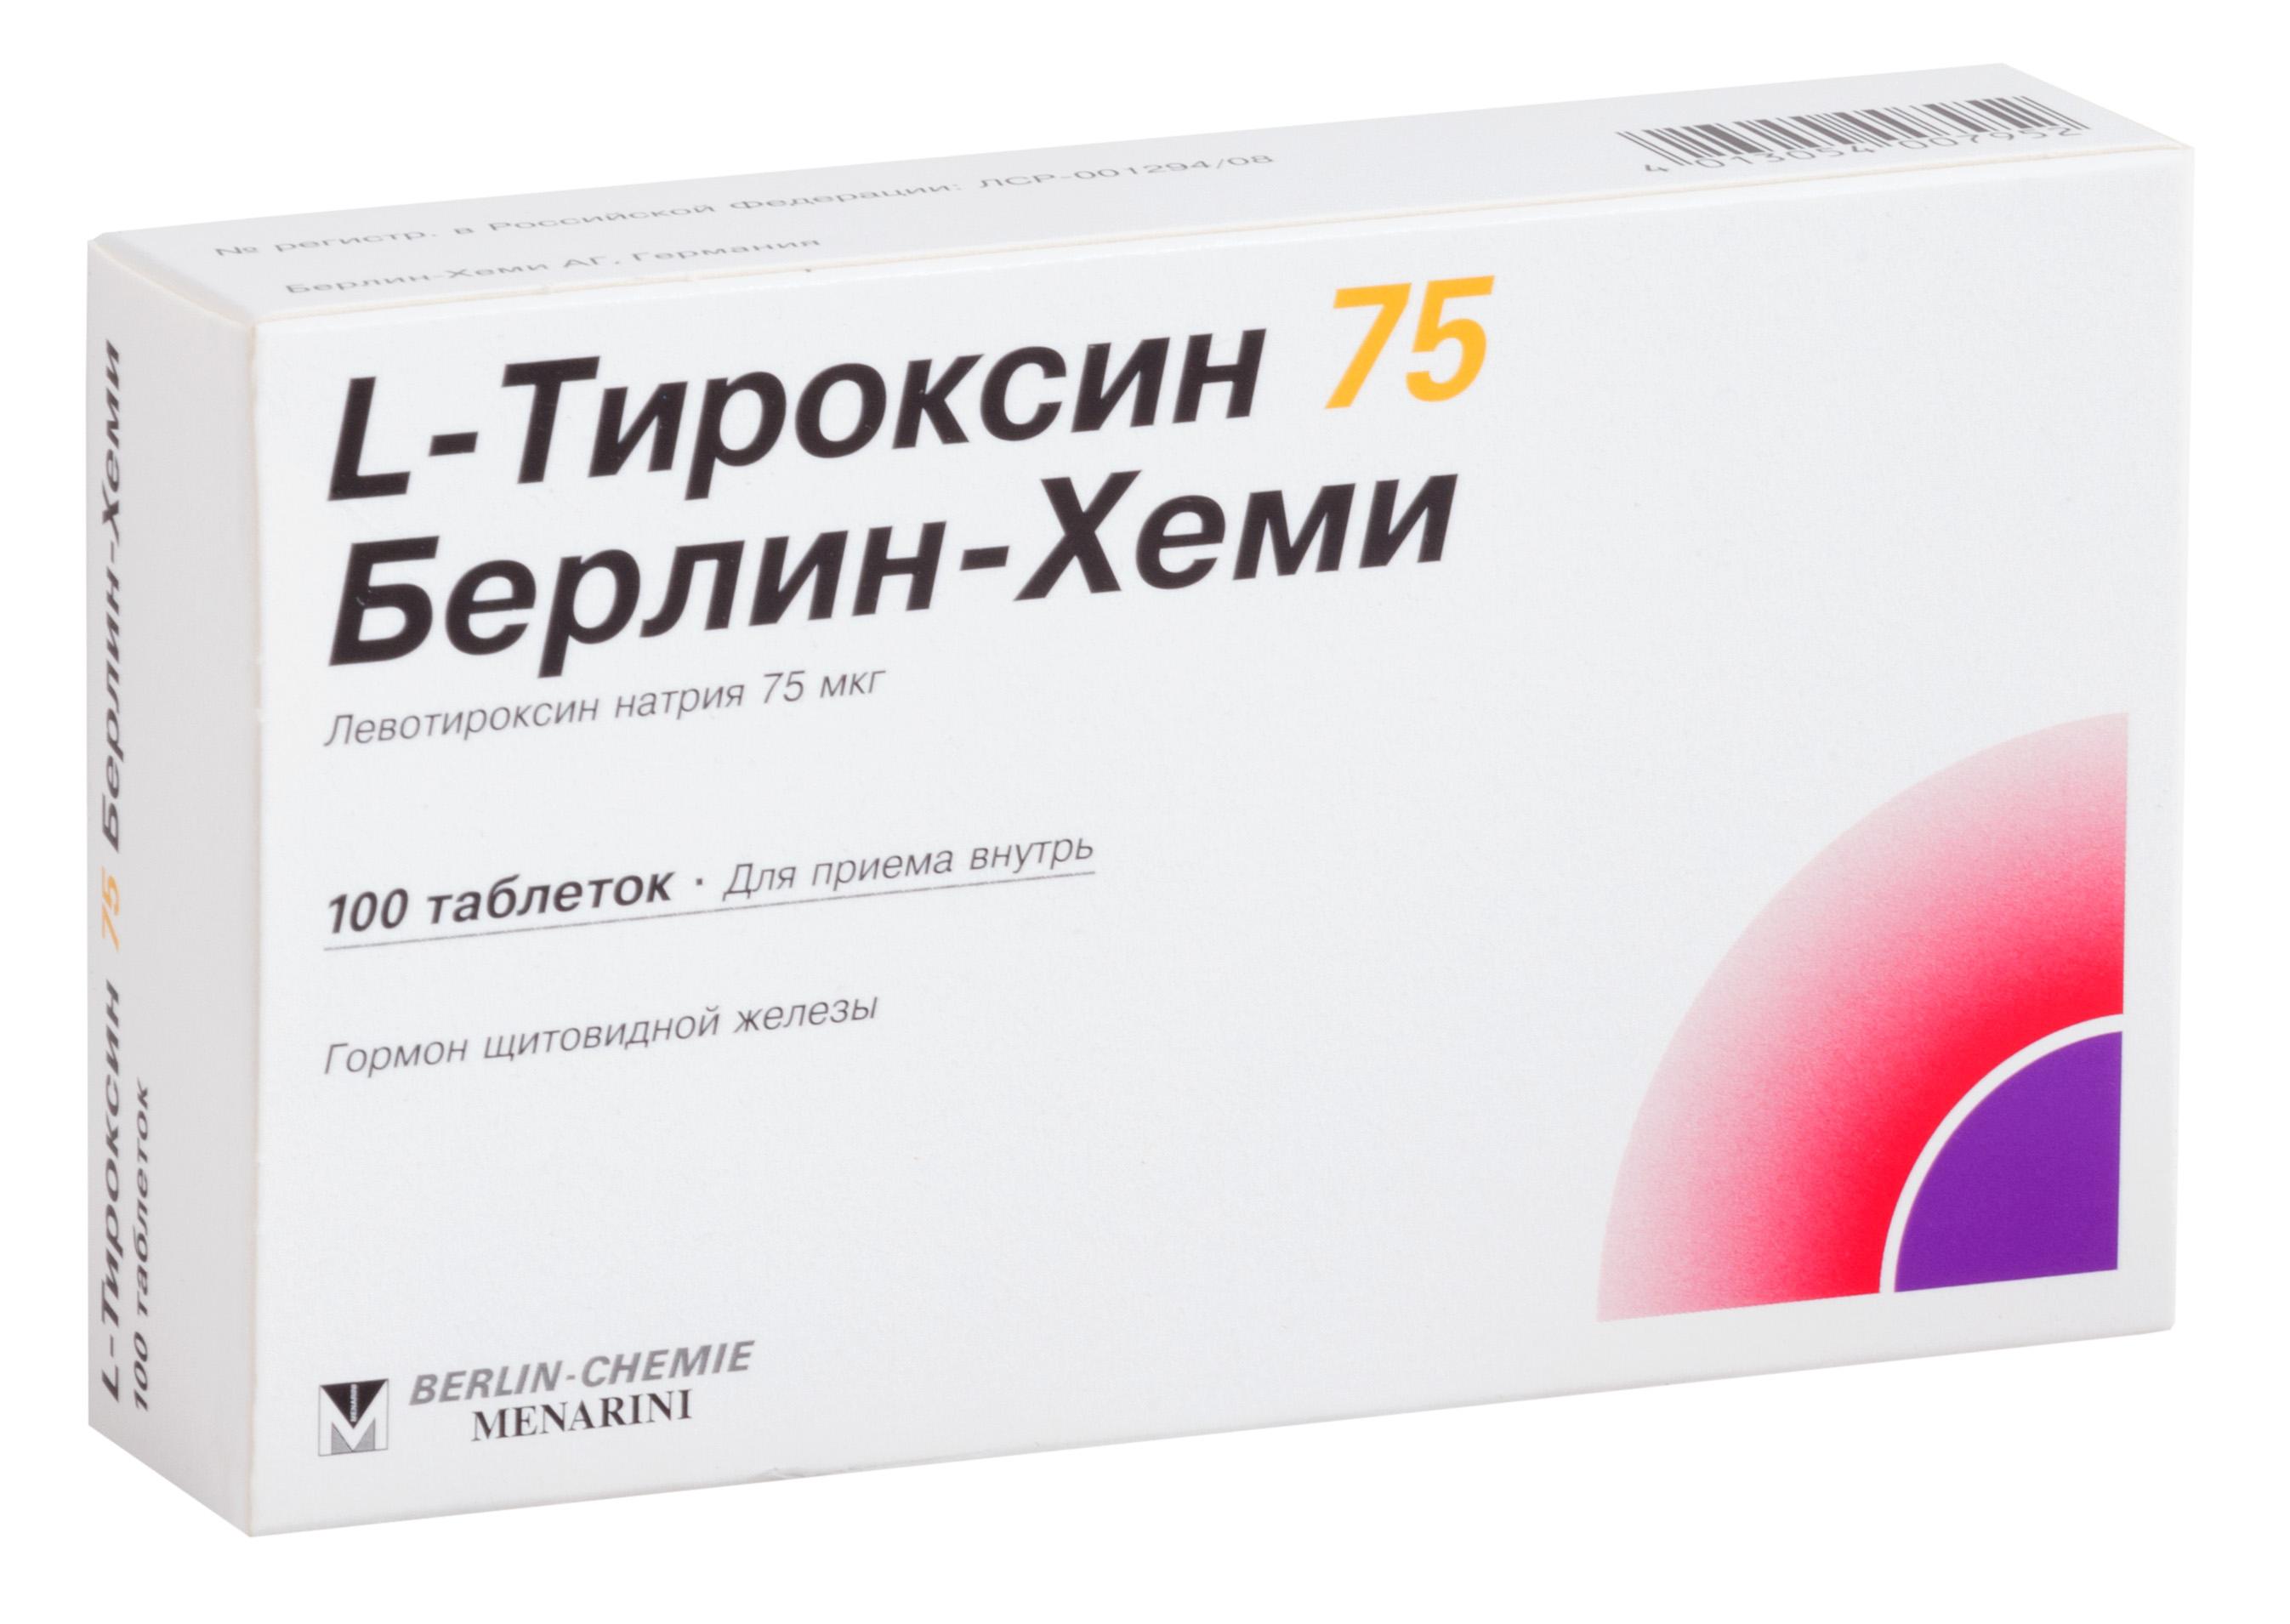 L-тироксин 75 берлин-хеми таб. 75мкг n100